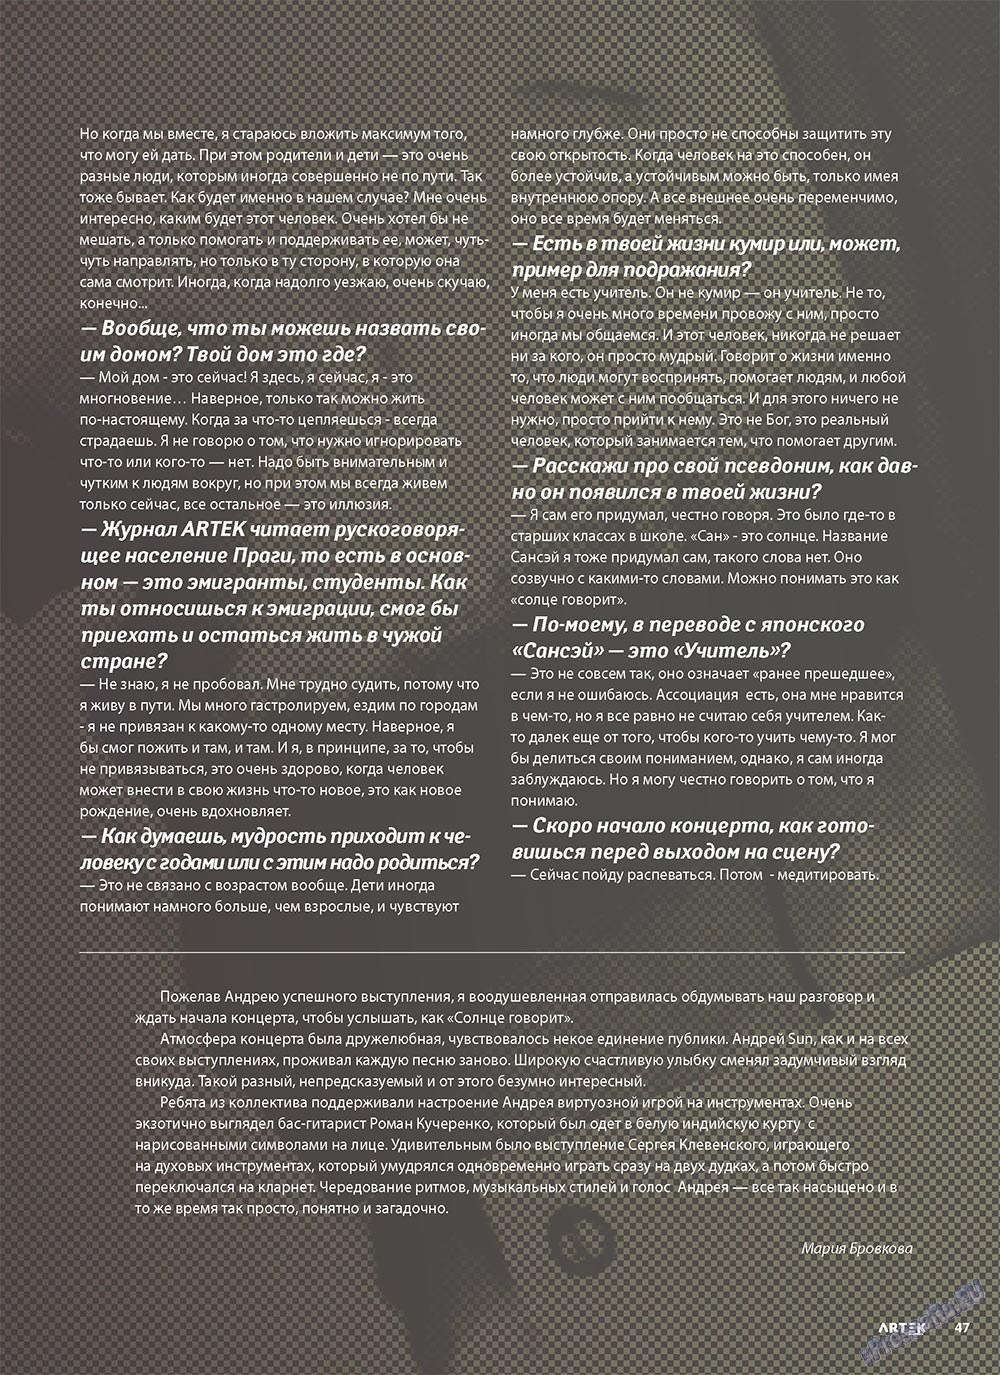 Артек (журнал). 2011 год, номер 2, стр. 49